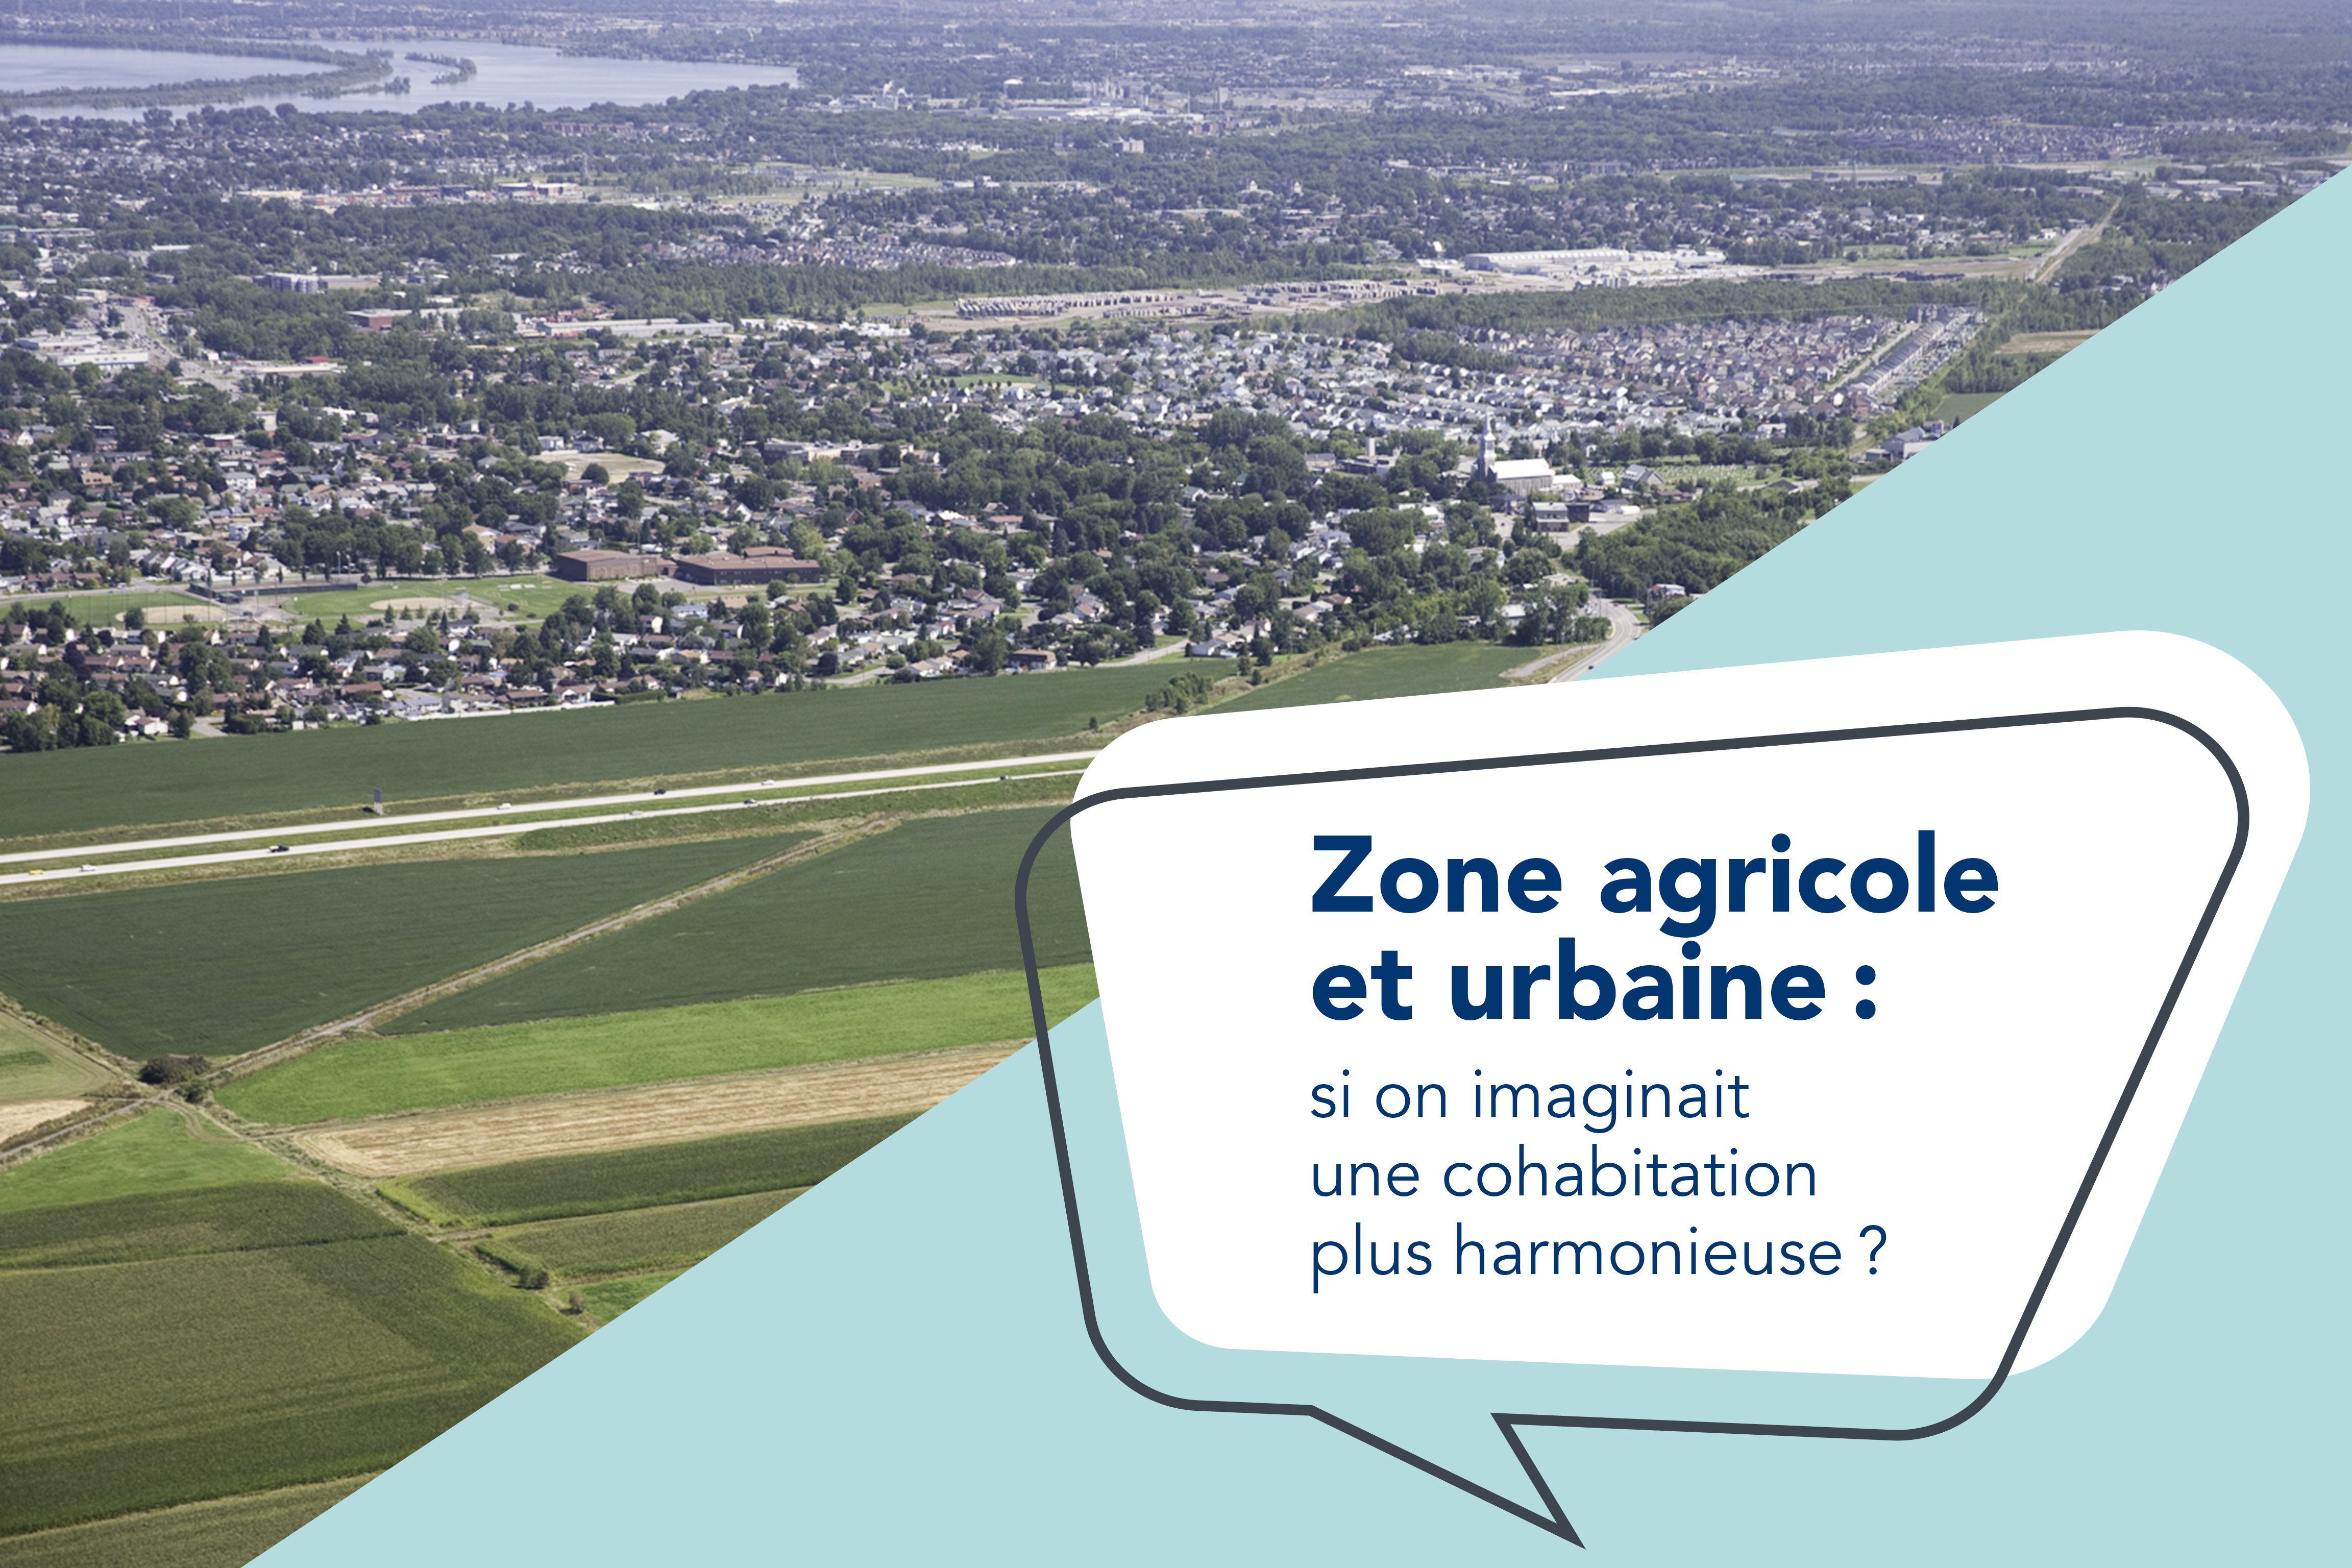 Zones agricole et urbaine : si on imaginait une cohabitation plus harmonieuse?